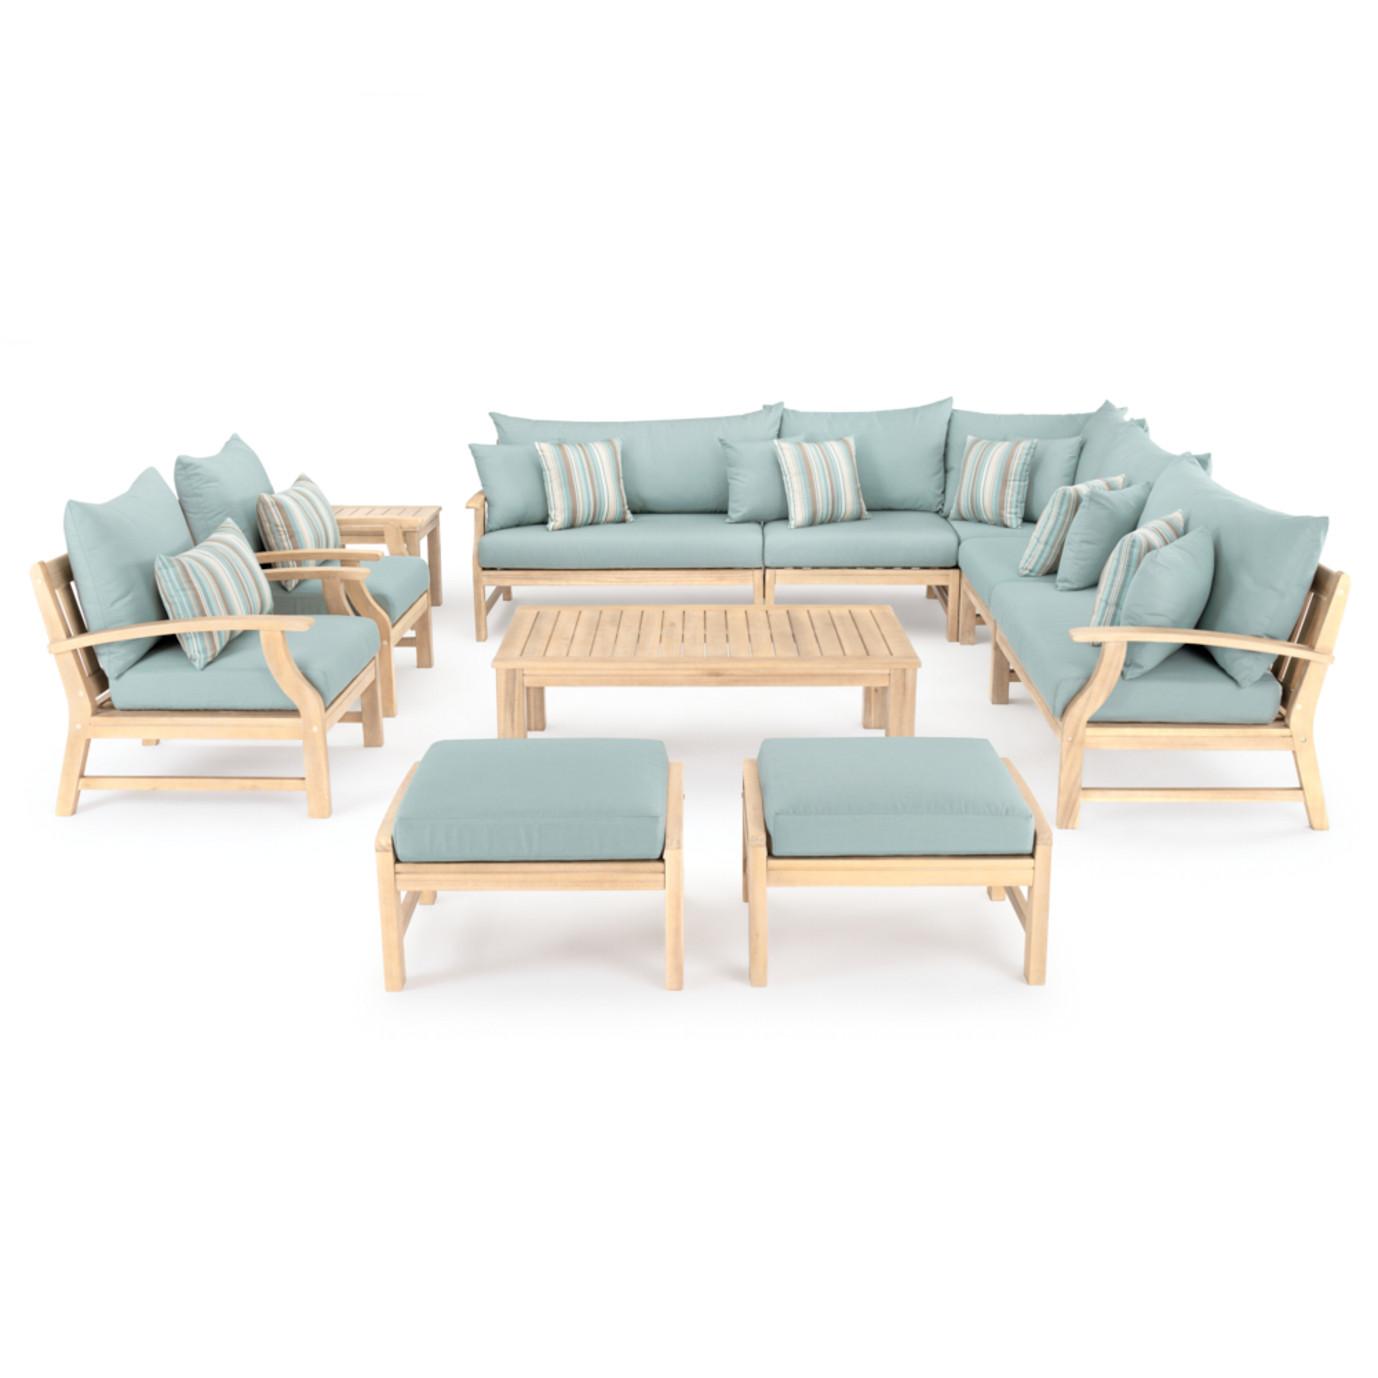 Kooper 11 Piece Estate Collection - Bliss Blue